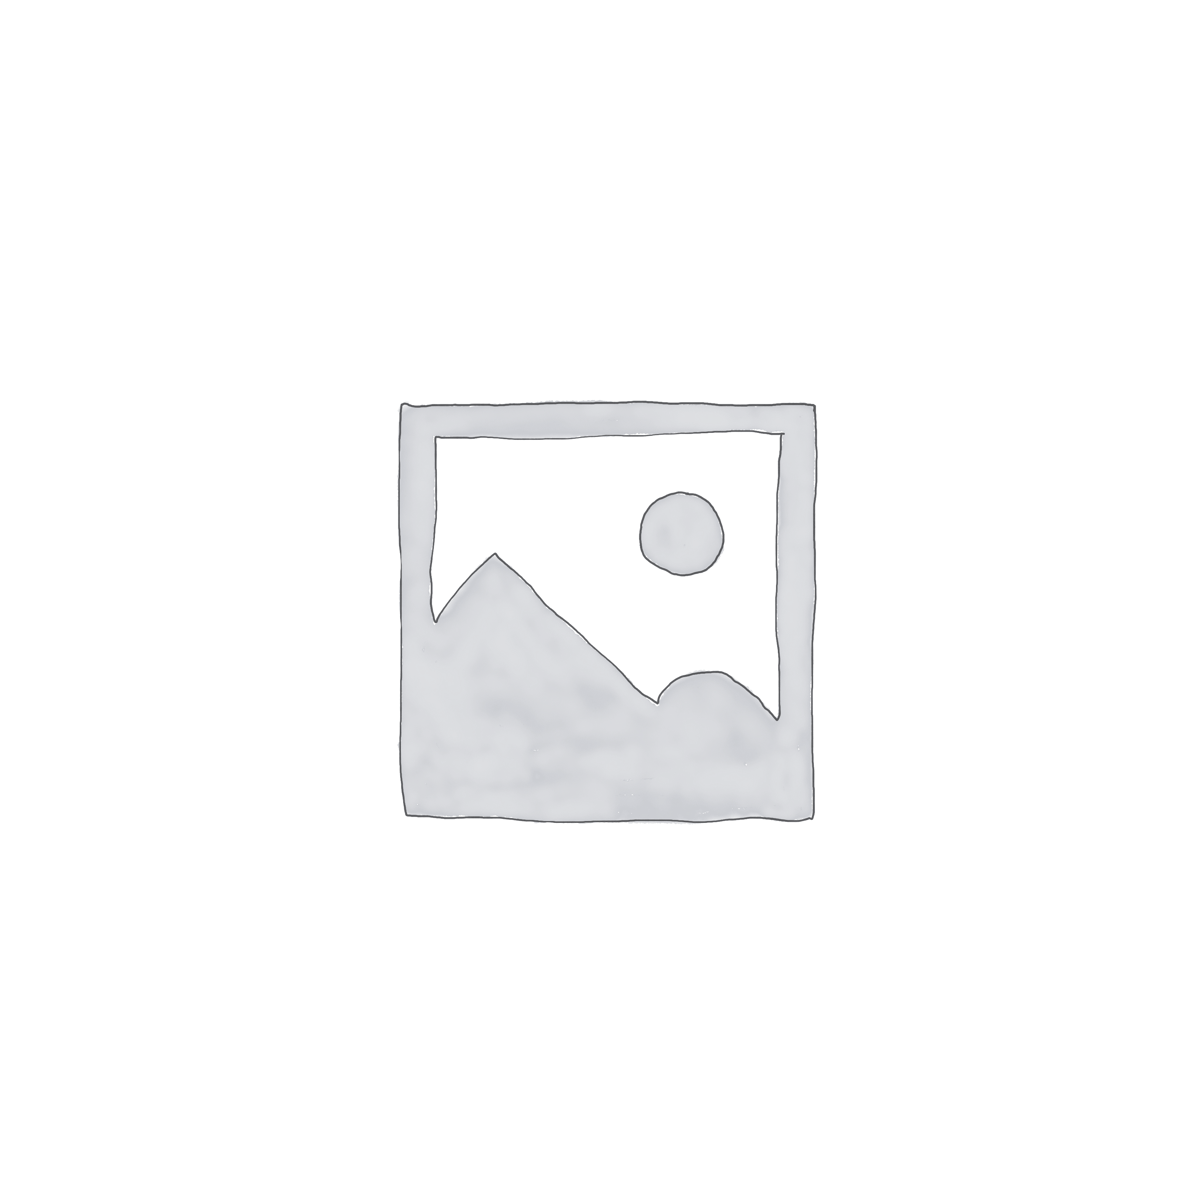 Diorama / Back Drop